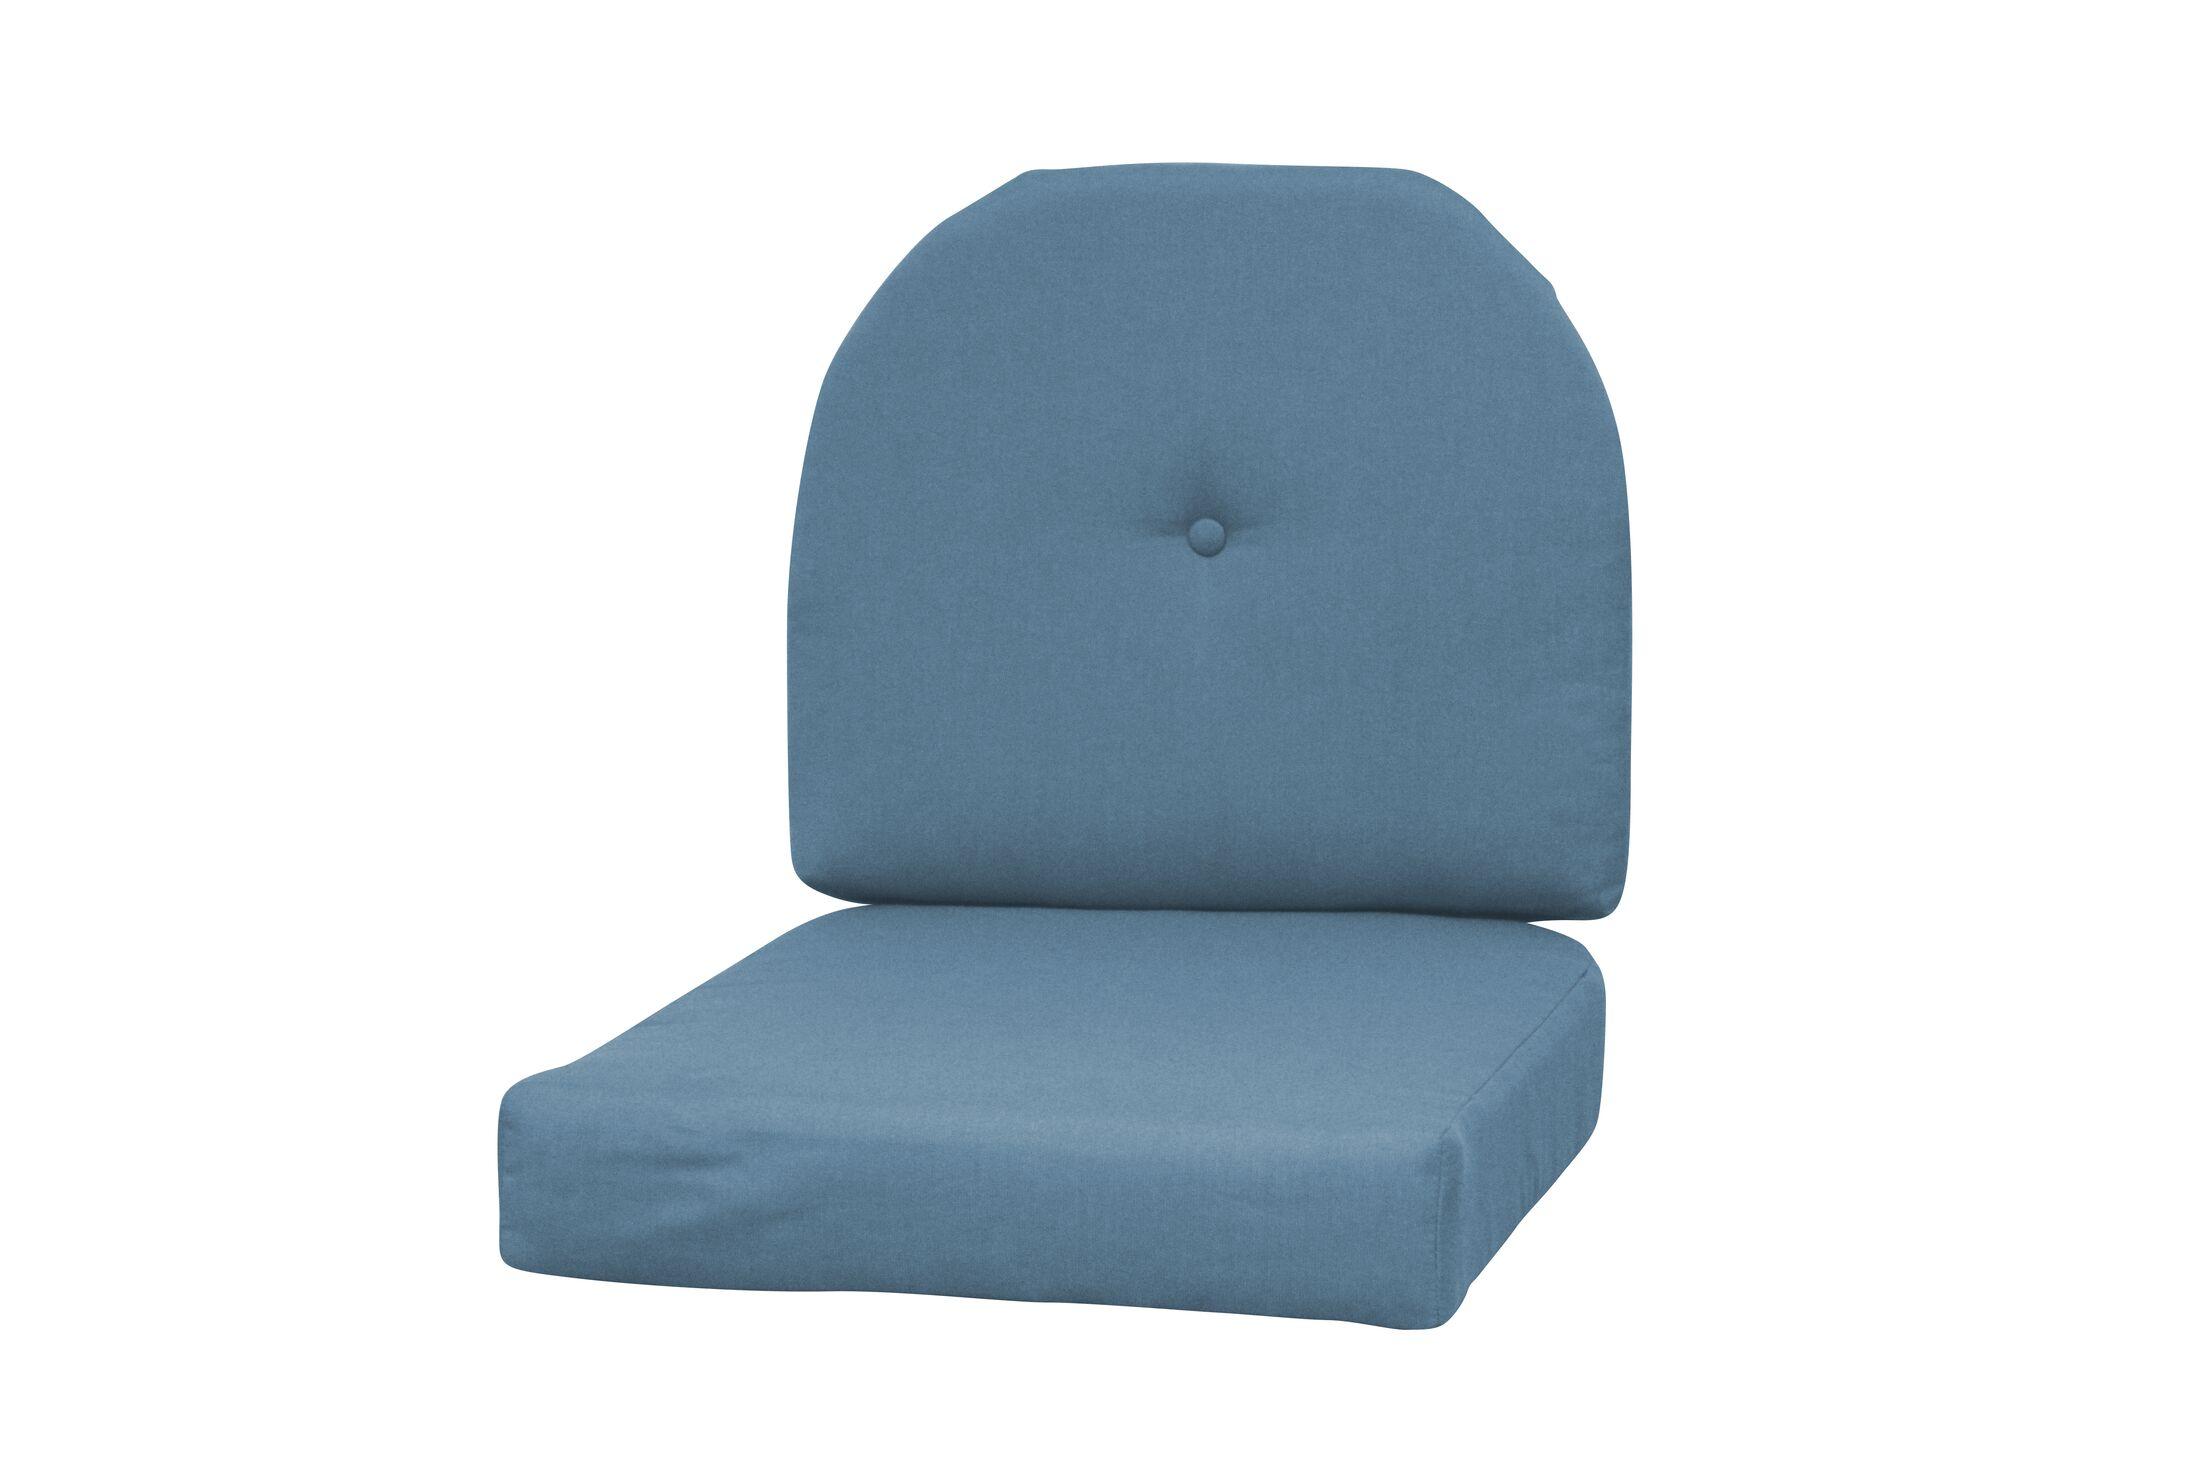 Wicker Indoor/Outdoor Sunbrella Rocking Chair Cushion Fabric: Denim